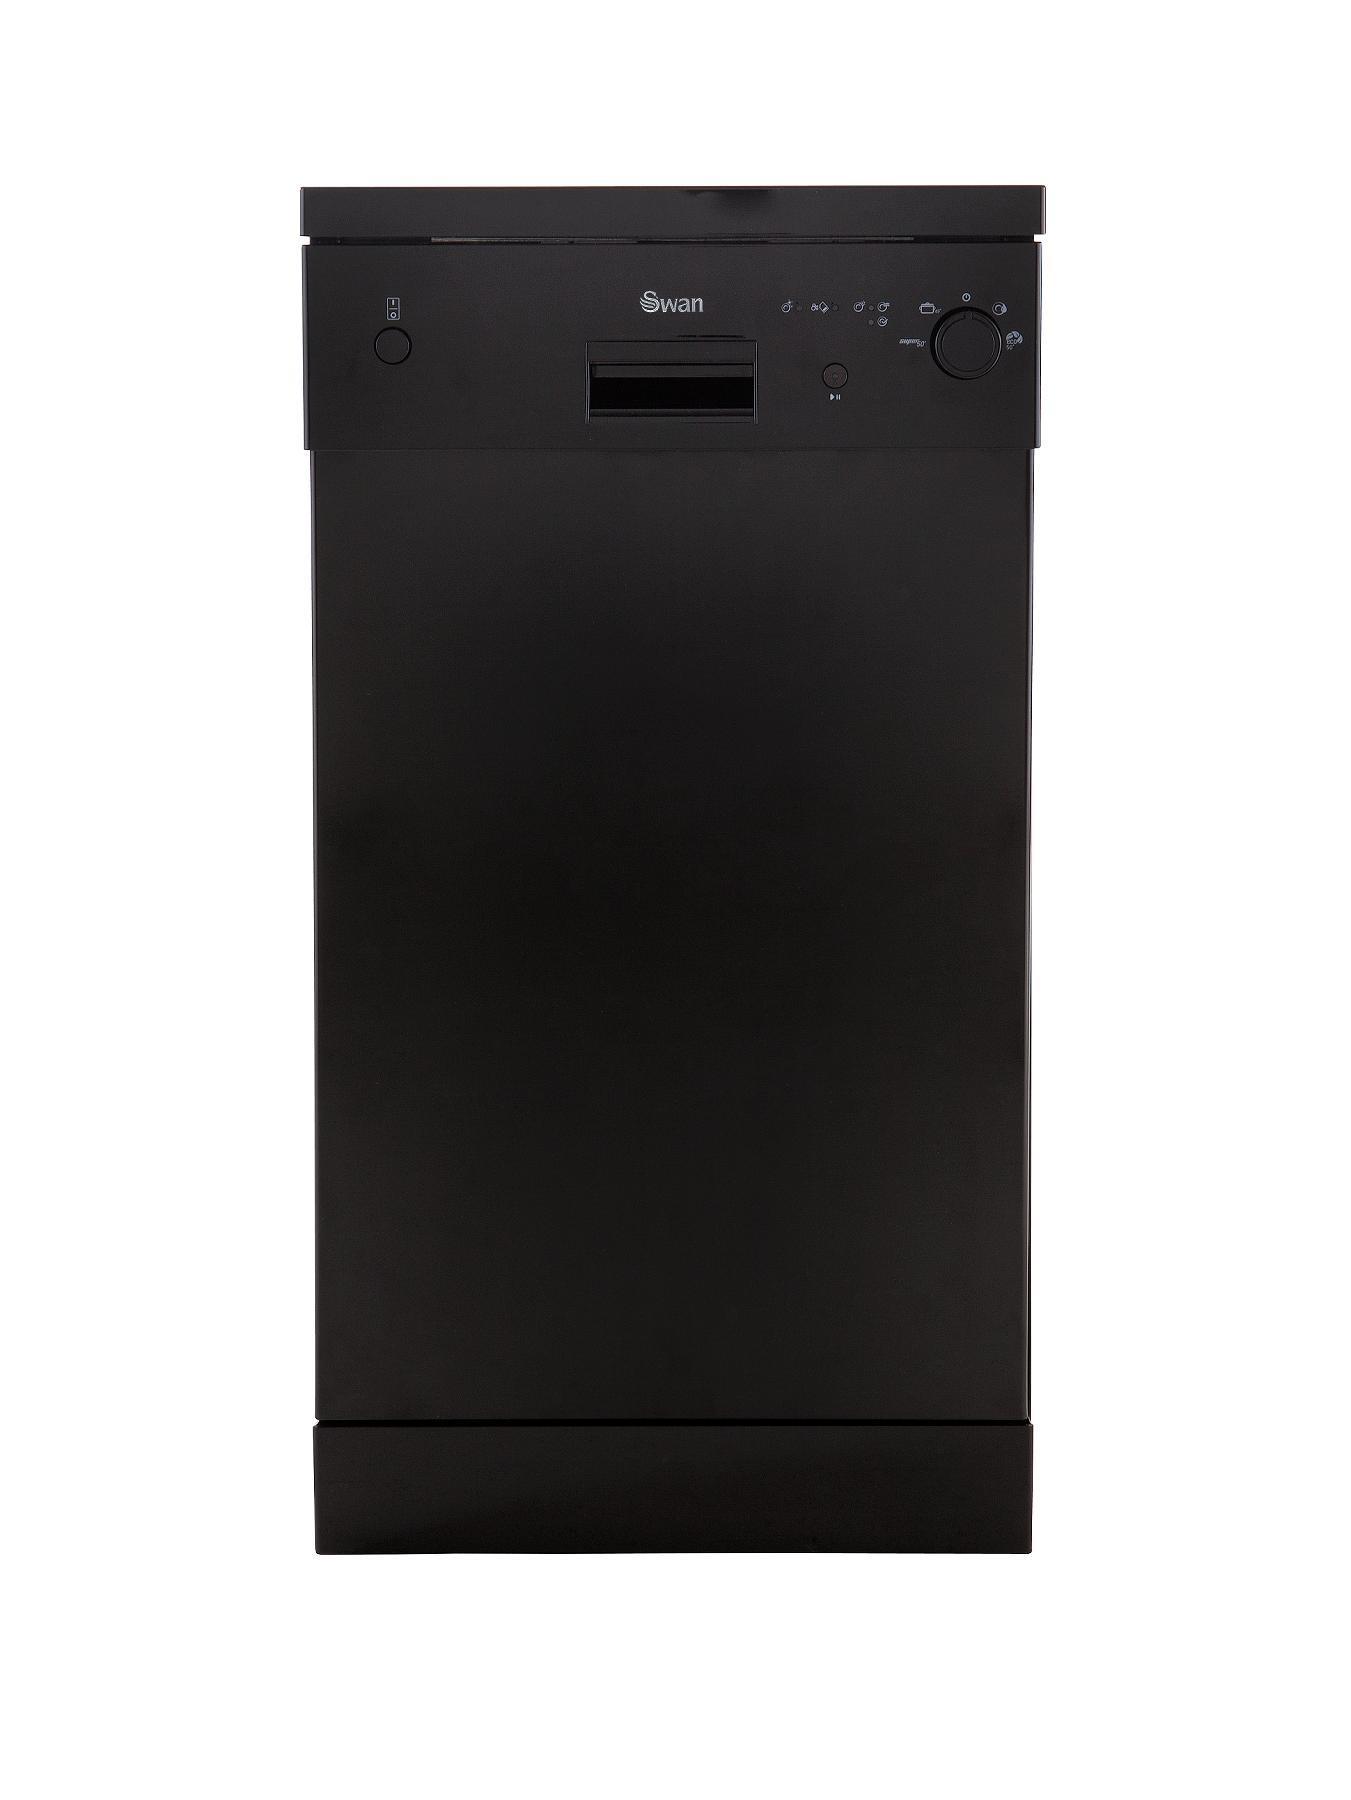 SDW2010B 10 Place Slimline Dishwasher - Black at Littlewoods